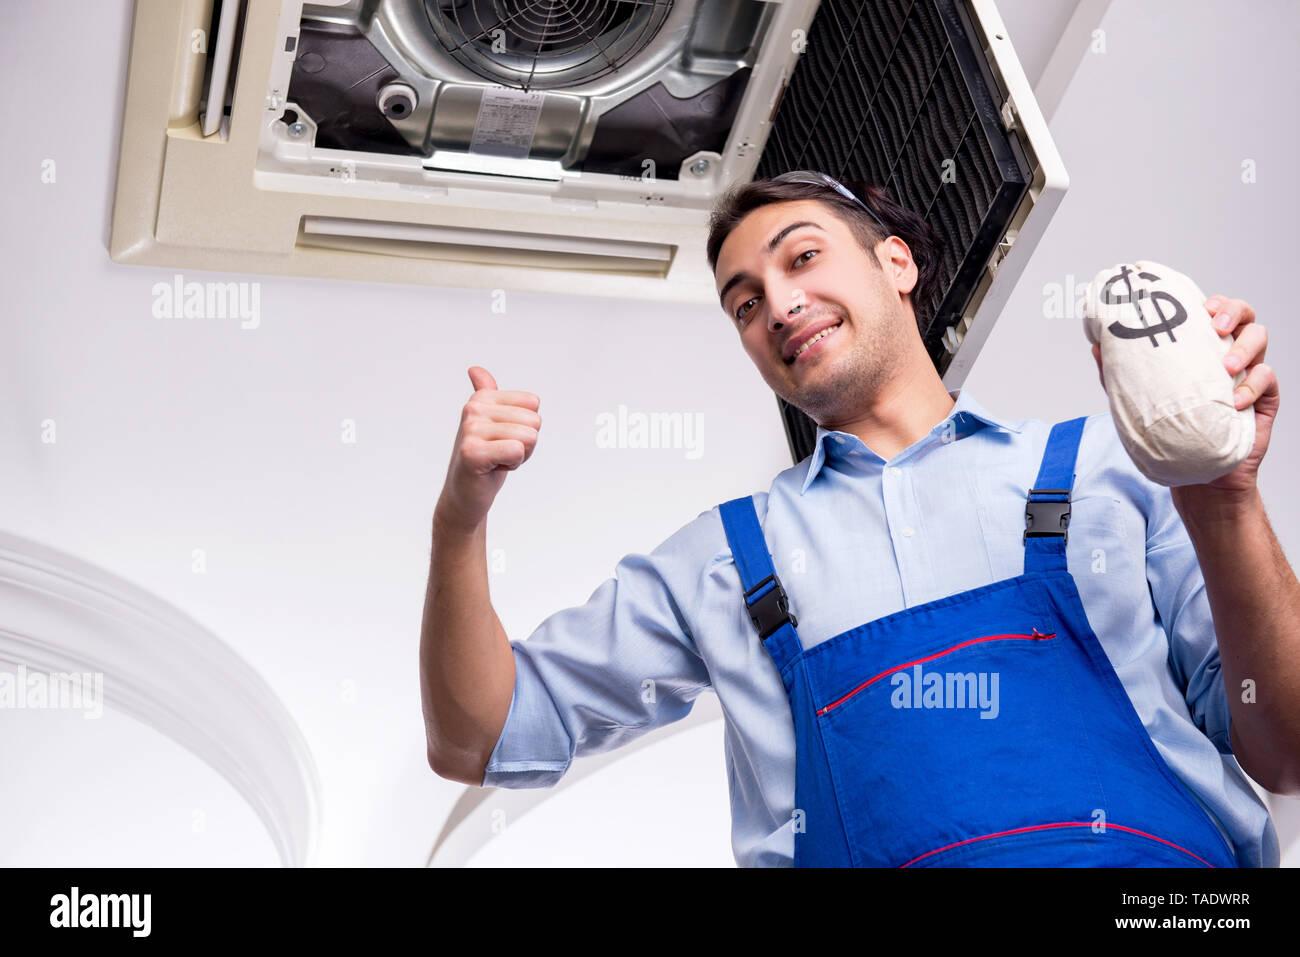 Young repairman repairing ceiling air conditioning unit - Stock Image